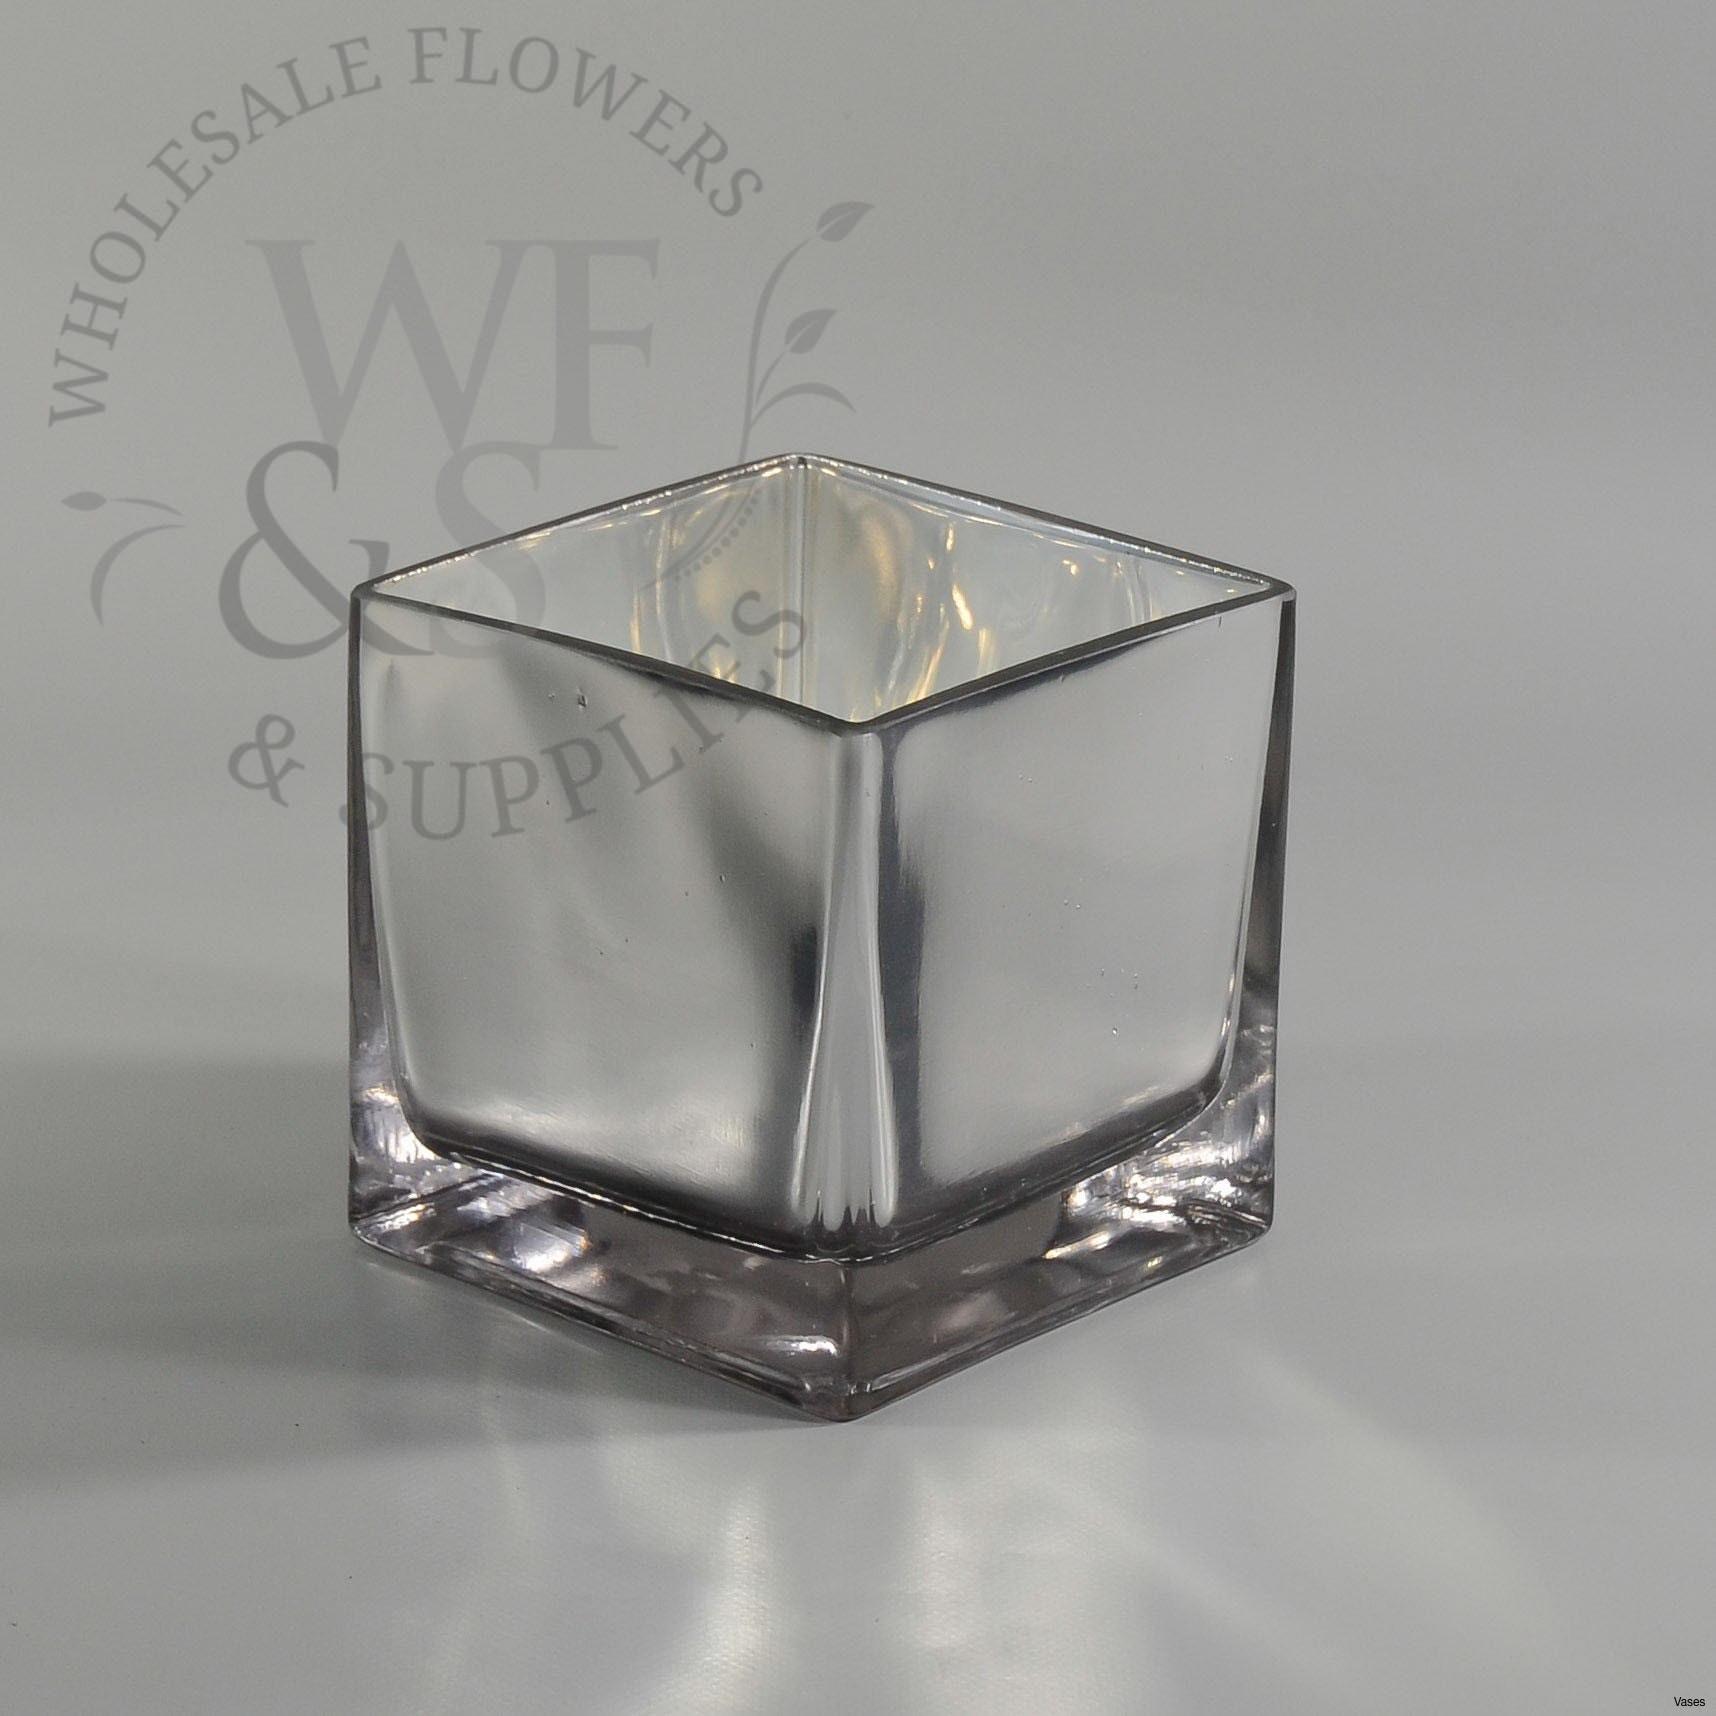 eastland cylinder vase set of 20 beautiful square black vases bogekompresorturkiye com pertaining to square mirrors lovely mirrored square vase 3h vases mirror table decorationi 0d weddings